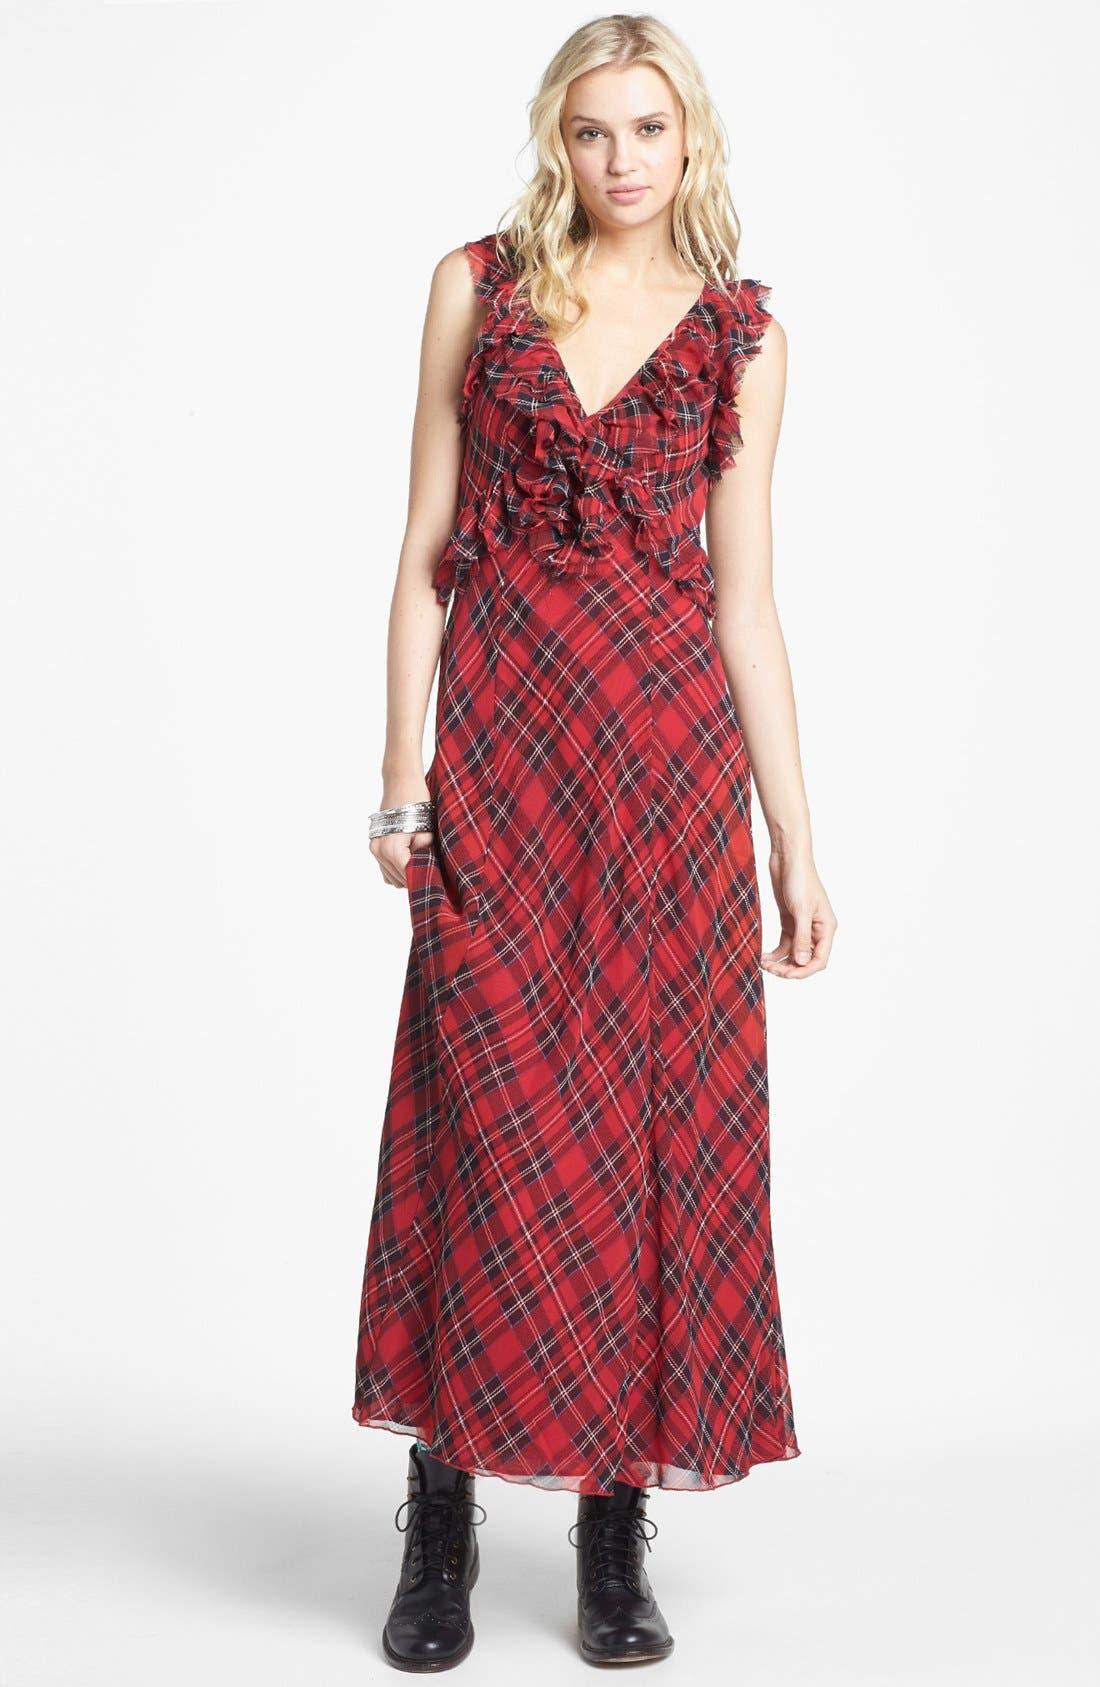 Alternate Image 1 Selected - Free People 'Venitia' Ruffled Plaid Maxi Dress